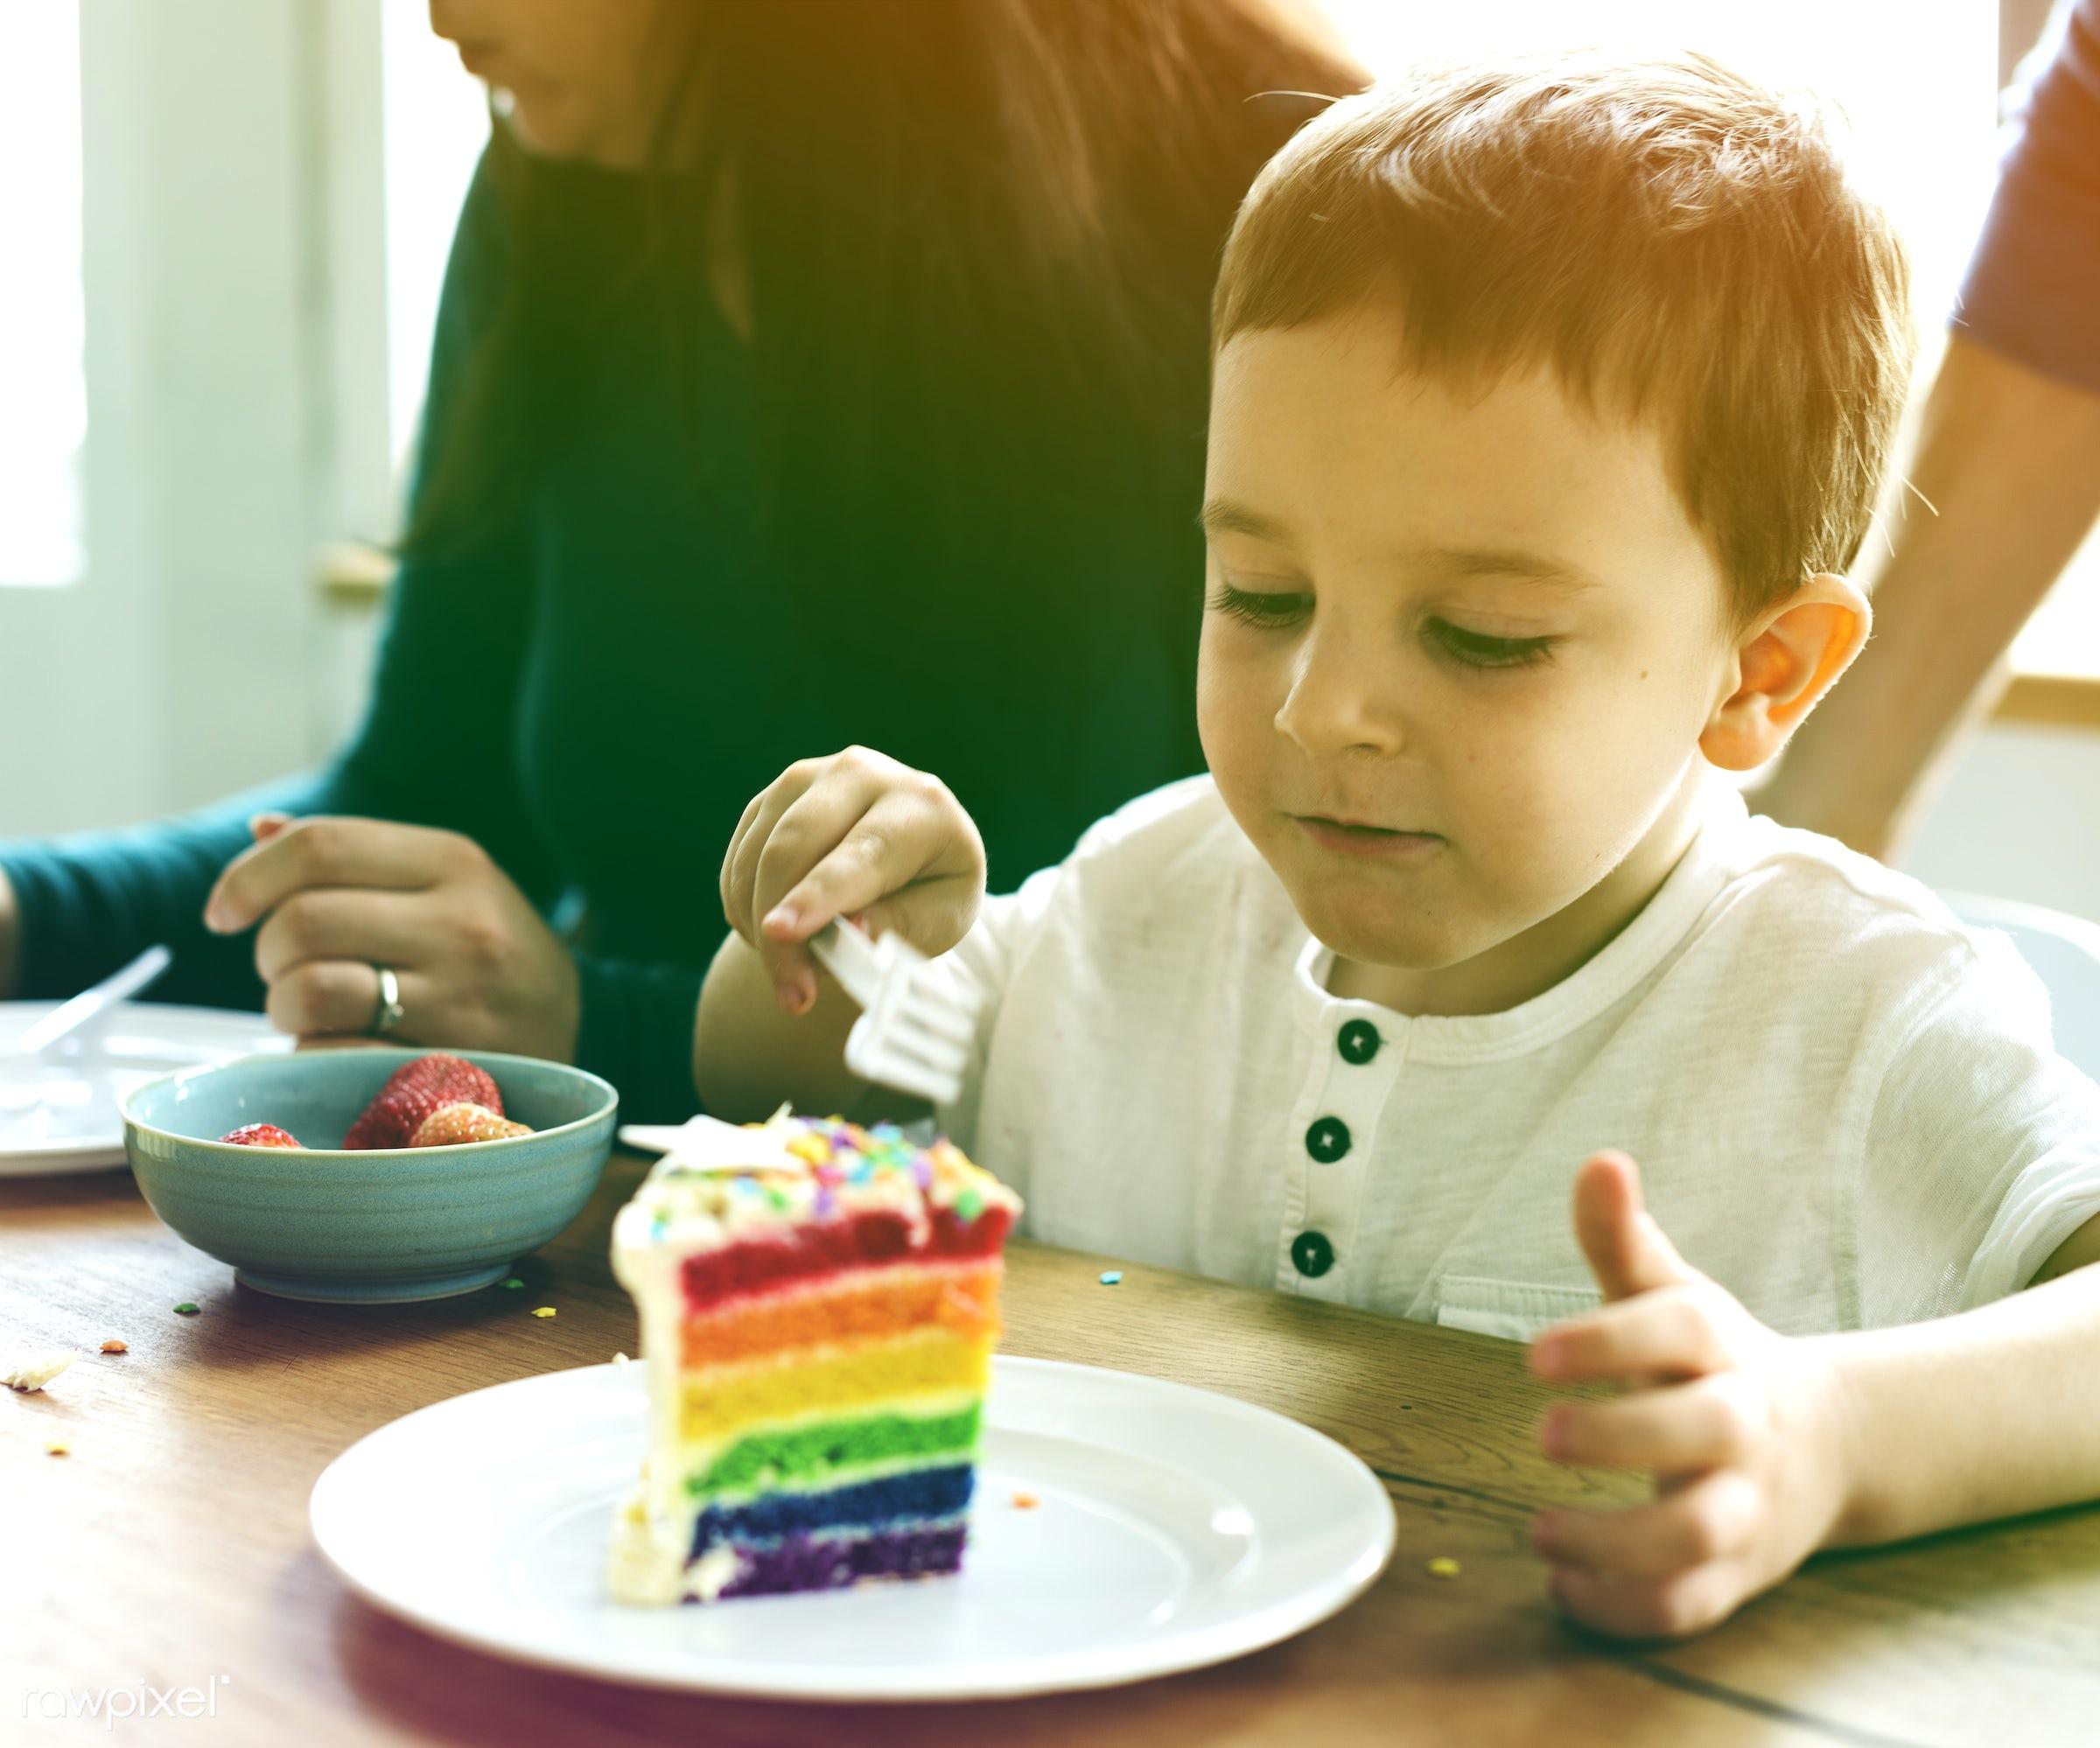 birth, rainbow cake, faded, little, vibrant, positivity, kid, event, family, blend, positive, cheerful, light, cake, art,...